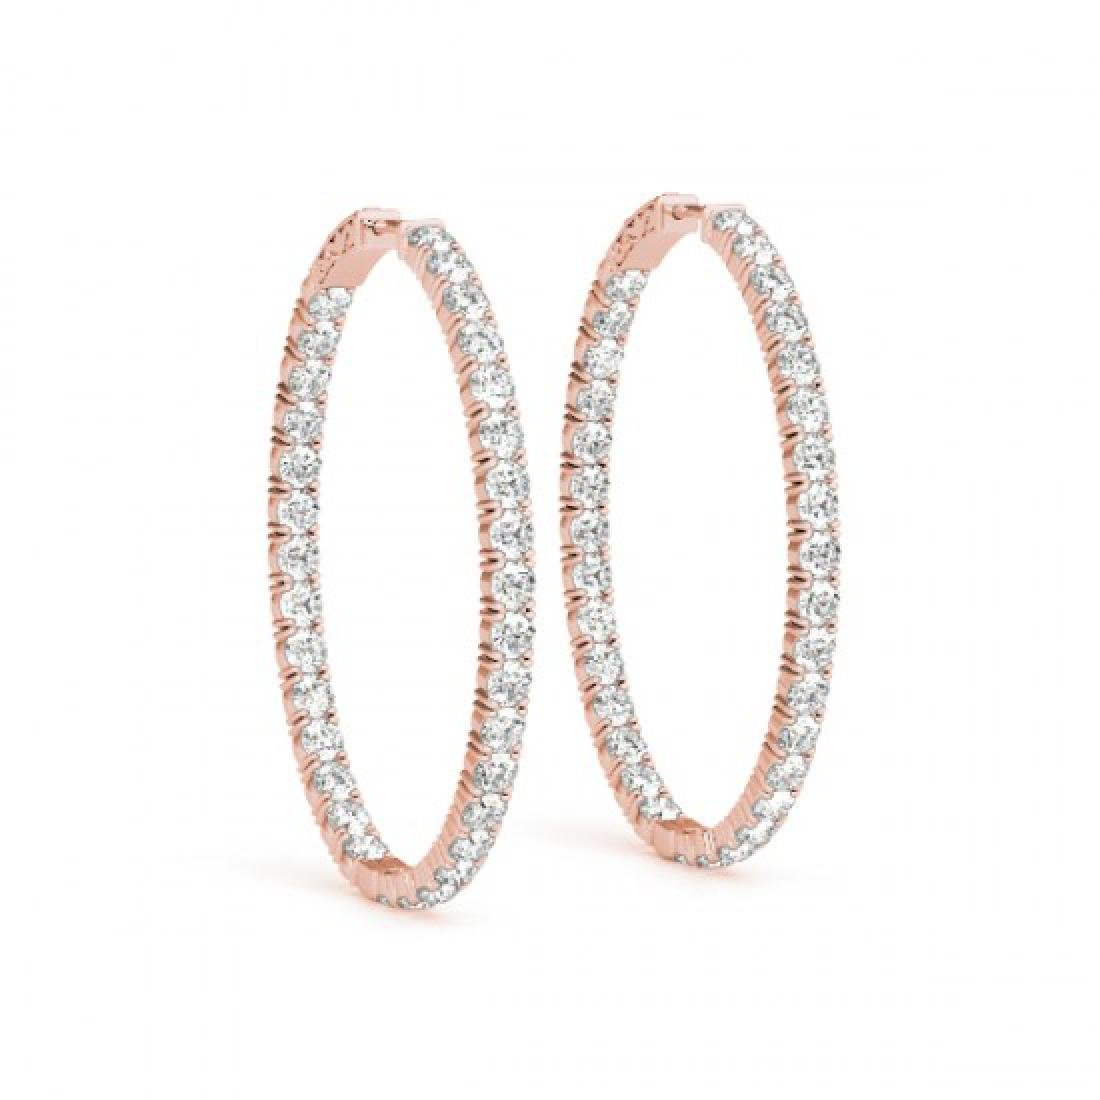 7 CTW Diamond VS/SI Certified 20 Mm Hoop Earrings 14K - 2